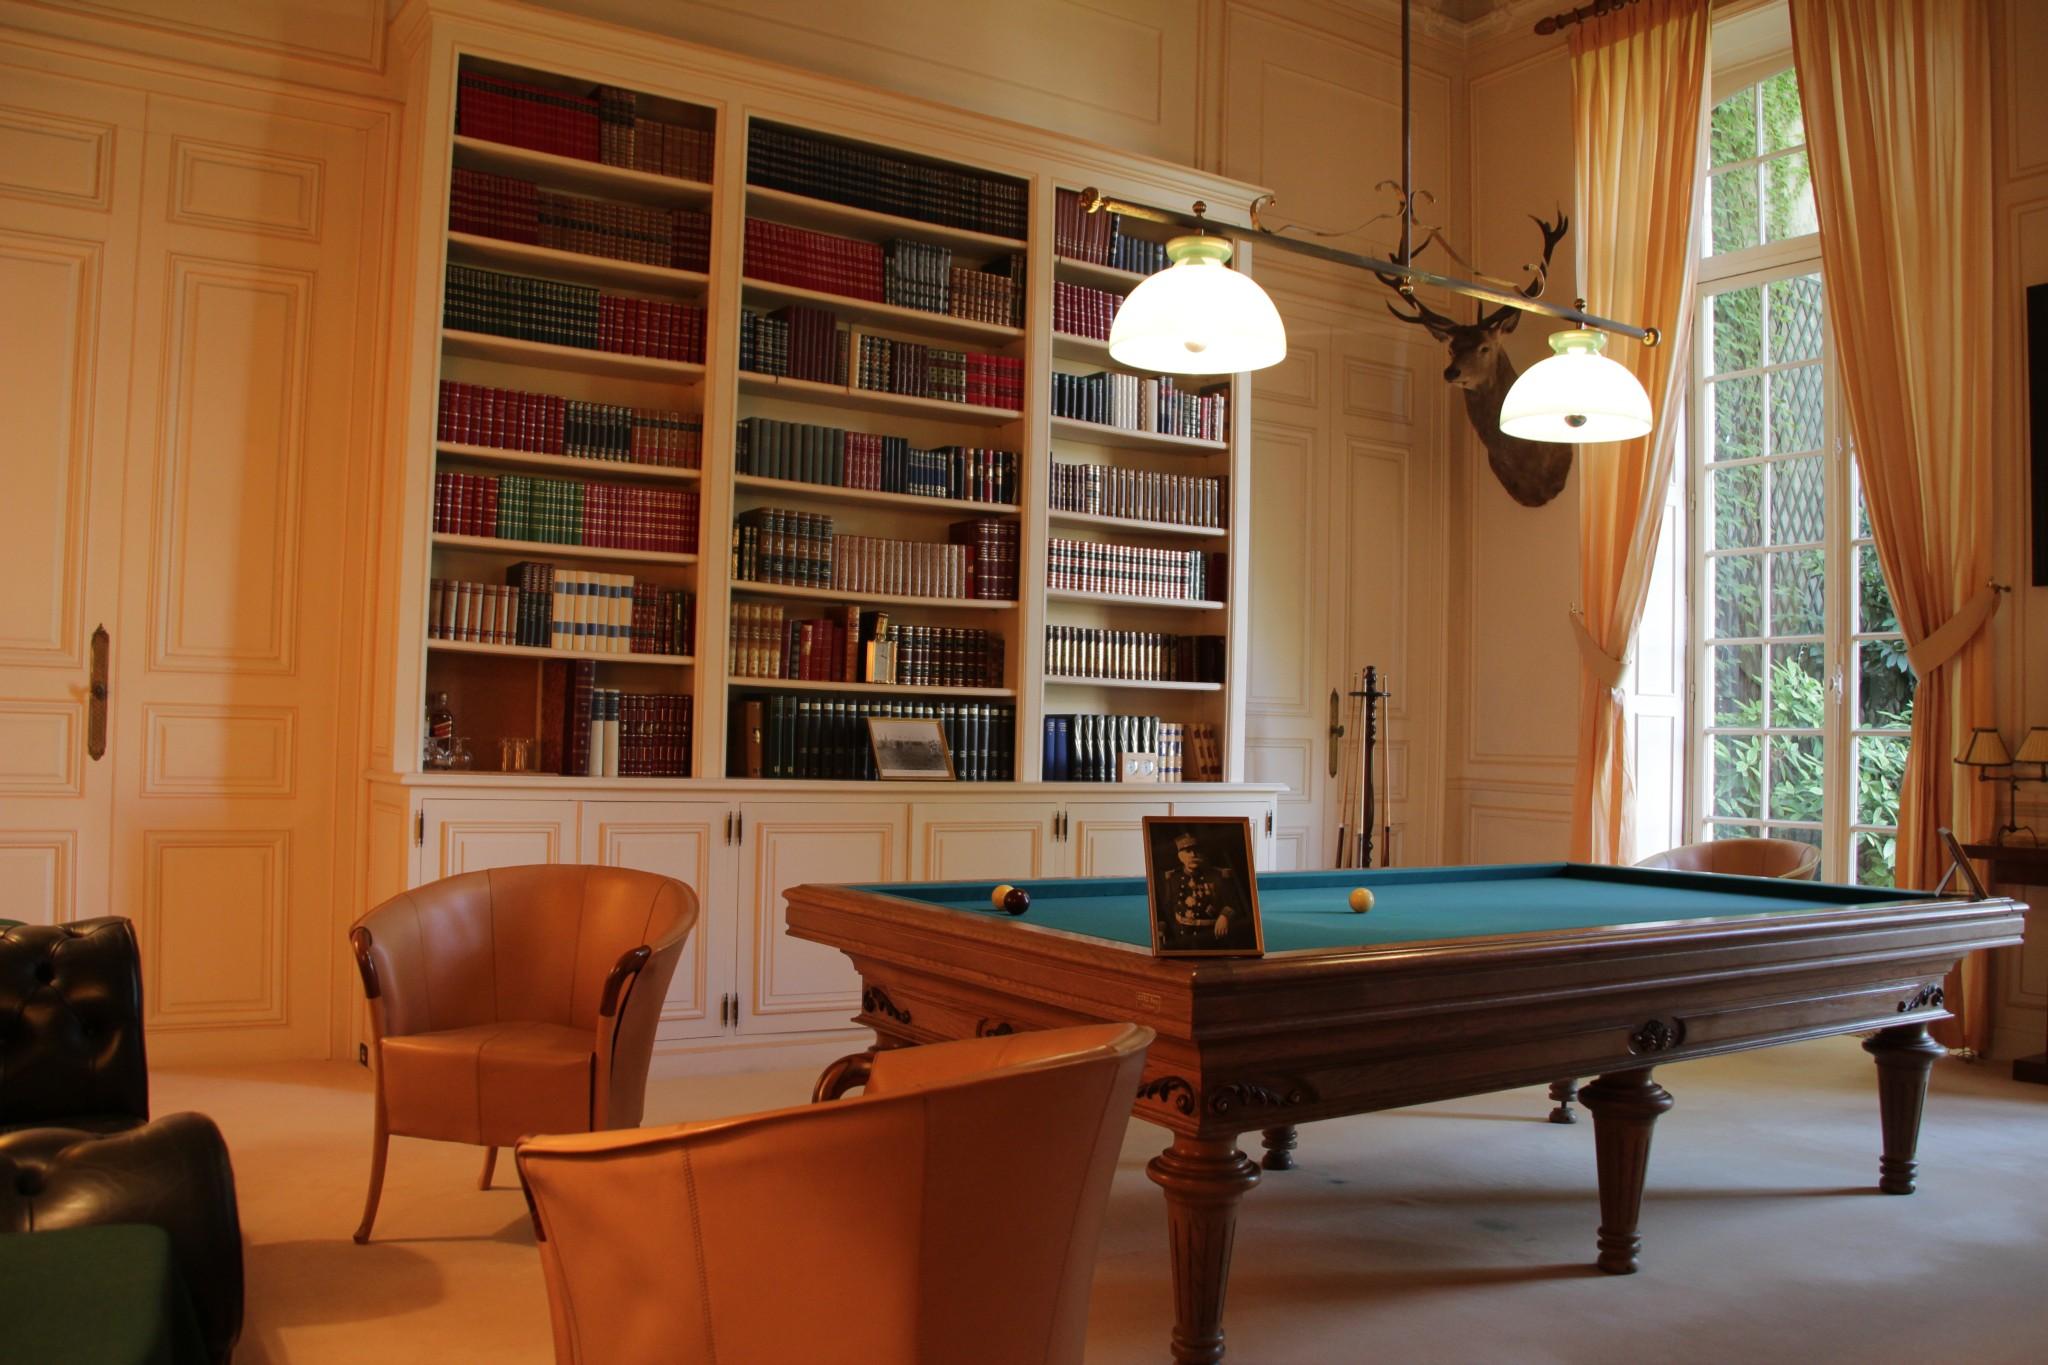 file salon hotel de wikimedia commons. Black Bedroom Furniture Sets. Home Design Ideas